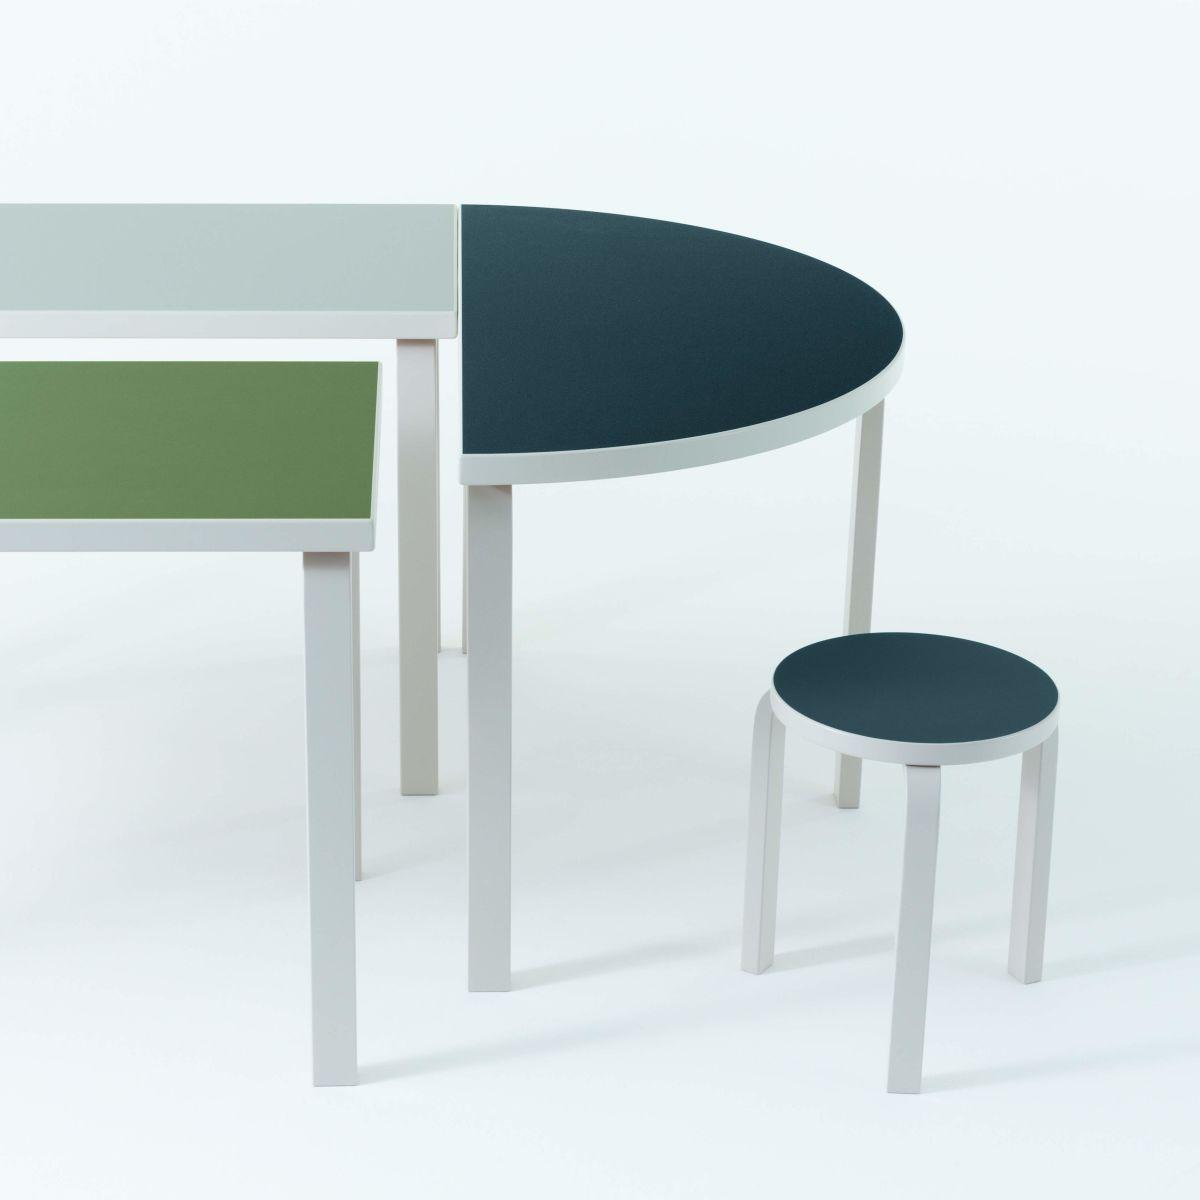 Aalto Table rectangular 80A Aalto Table half-round 95 Stool 60 stone white lacquer